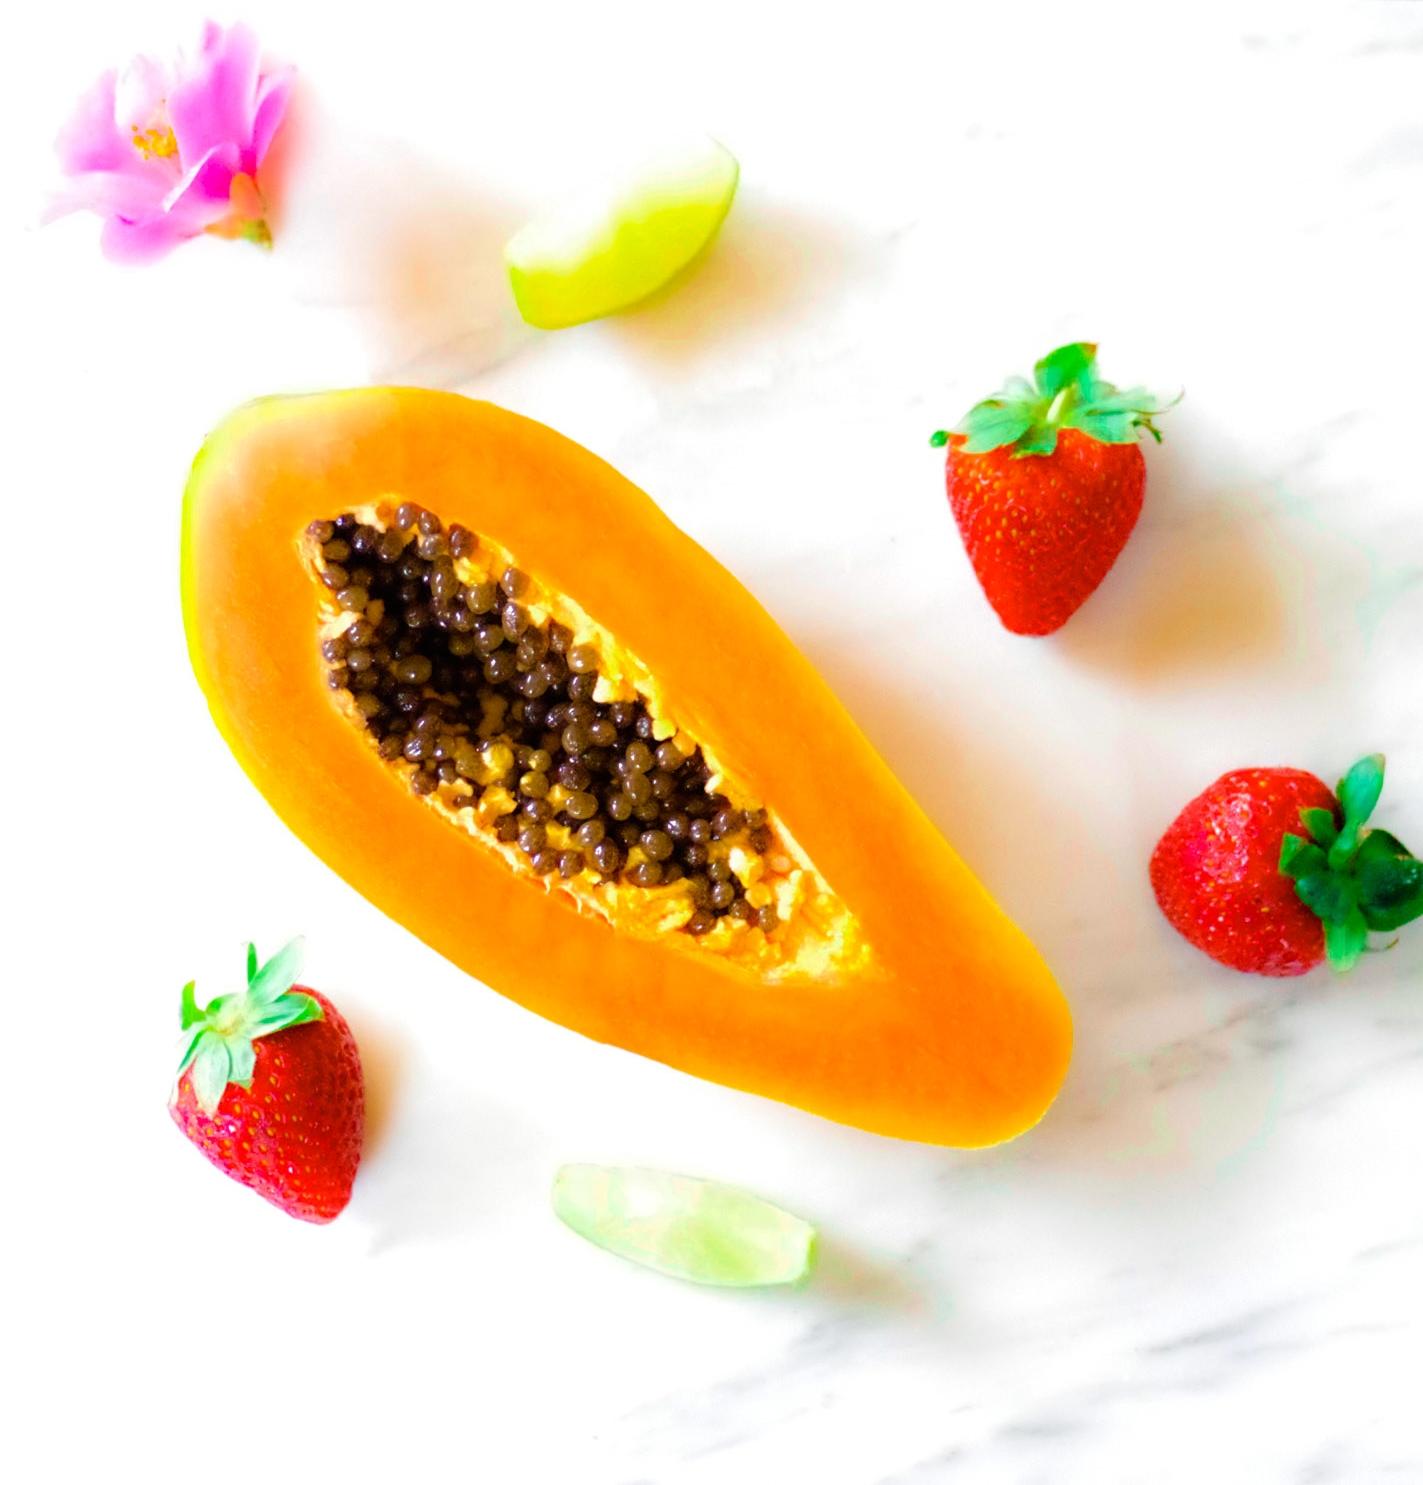 Beautiful papaya!